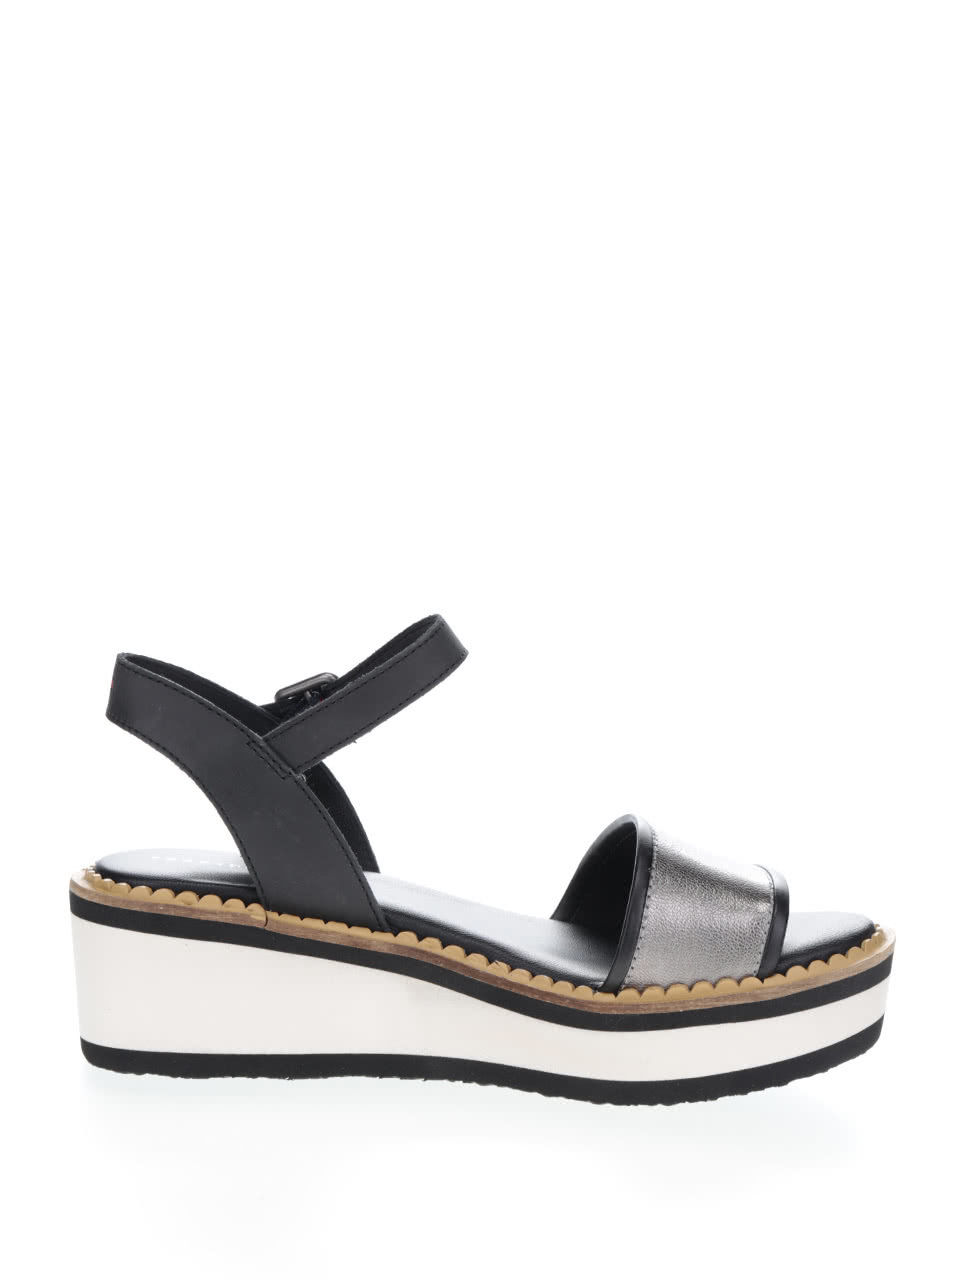 Krémovo-čierne dámske sandále na platforme Tommy Hilfiger ... f8dcc4c4473